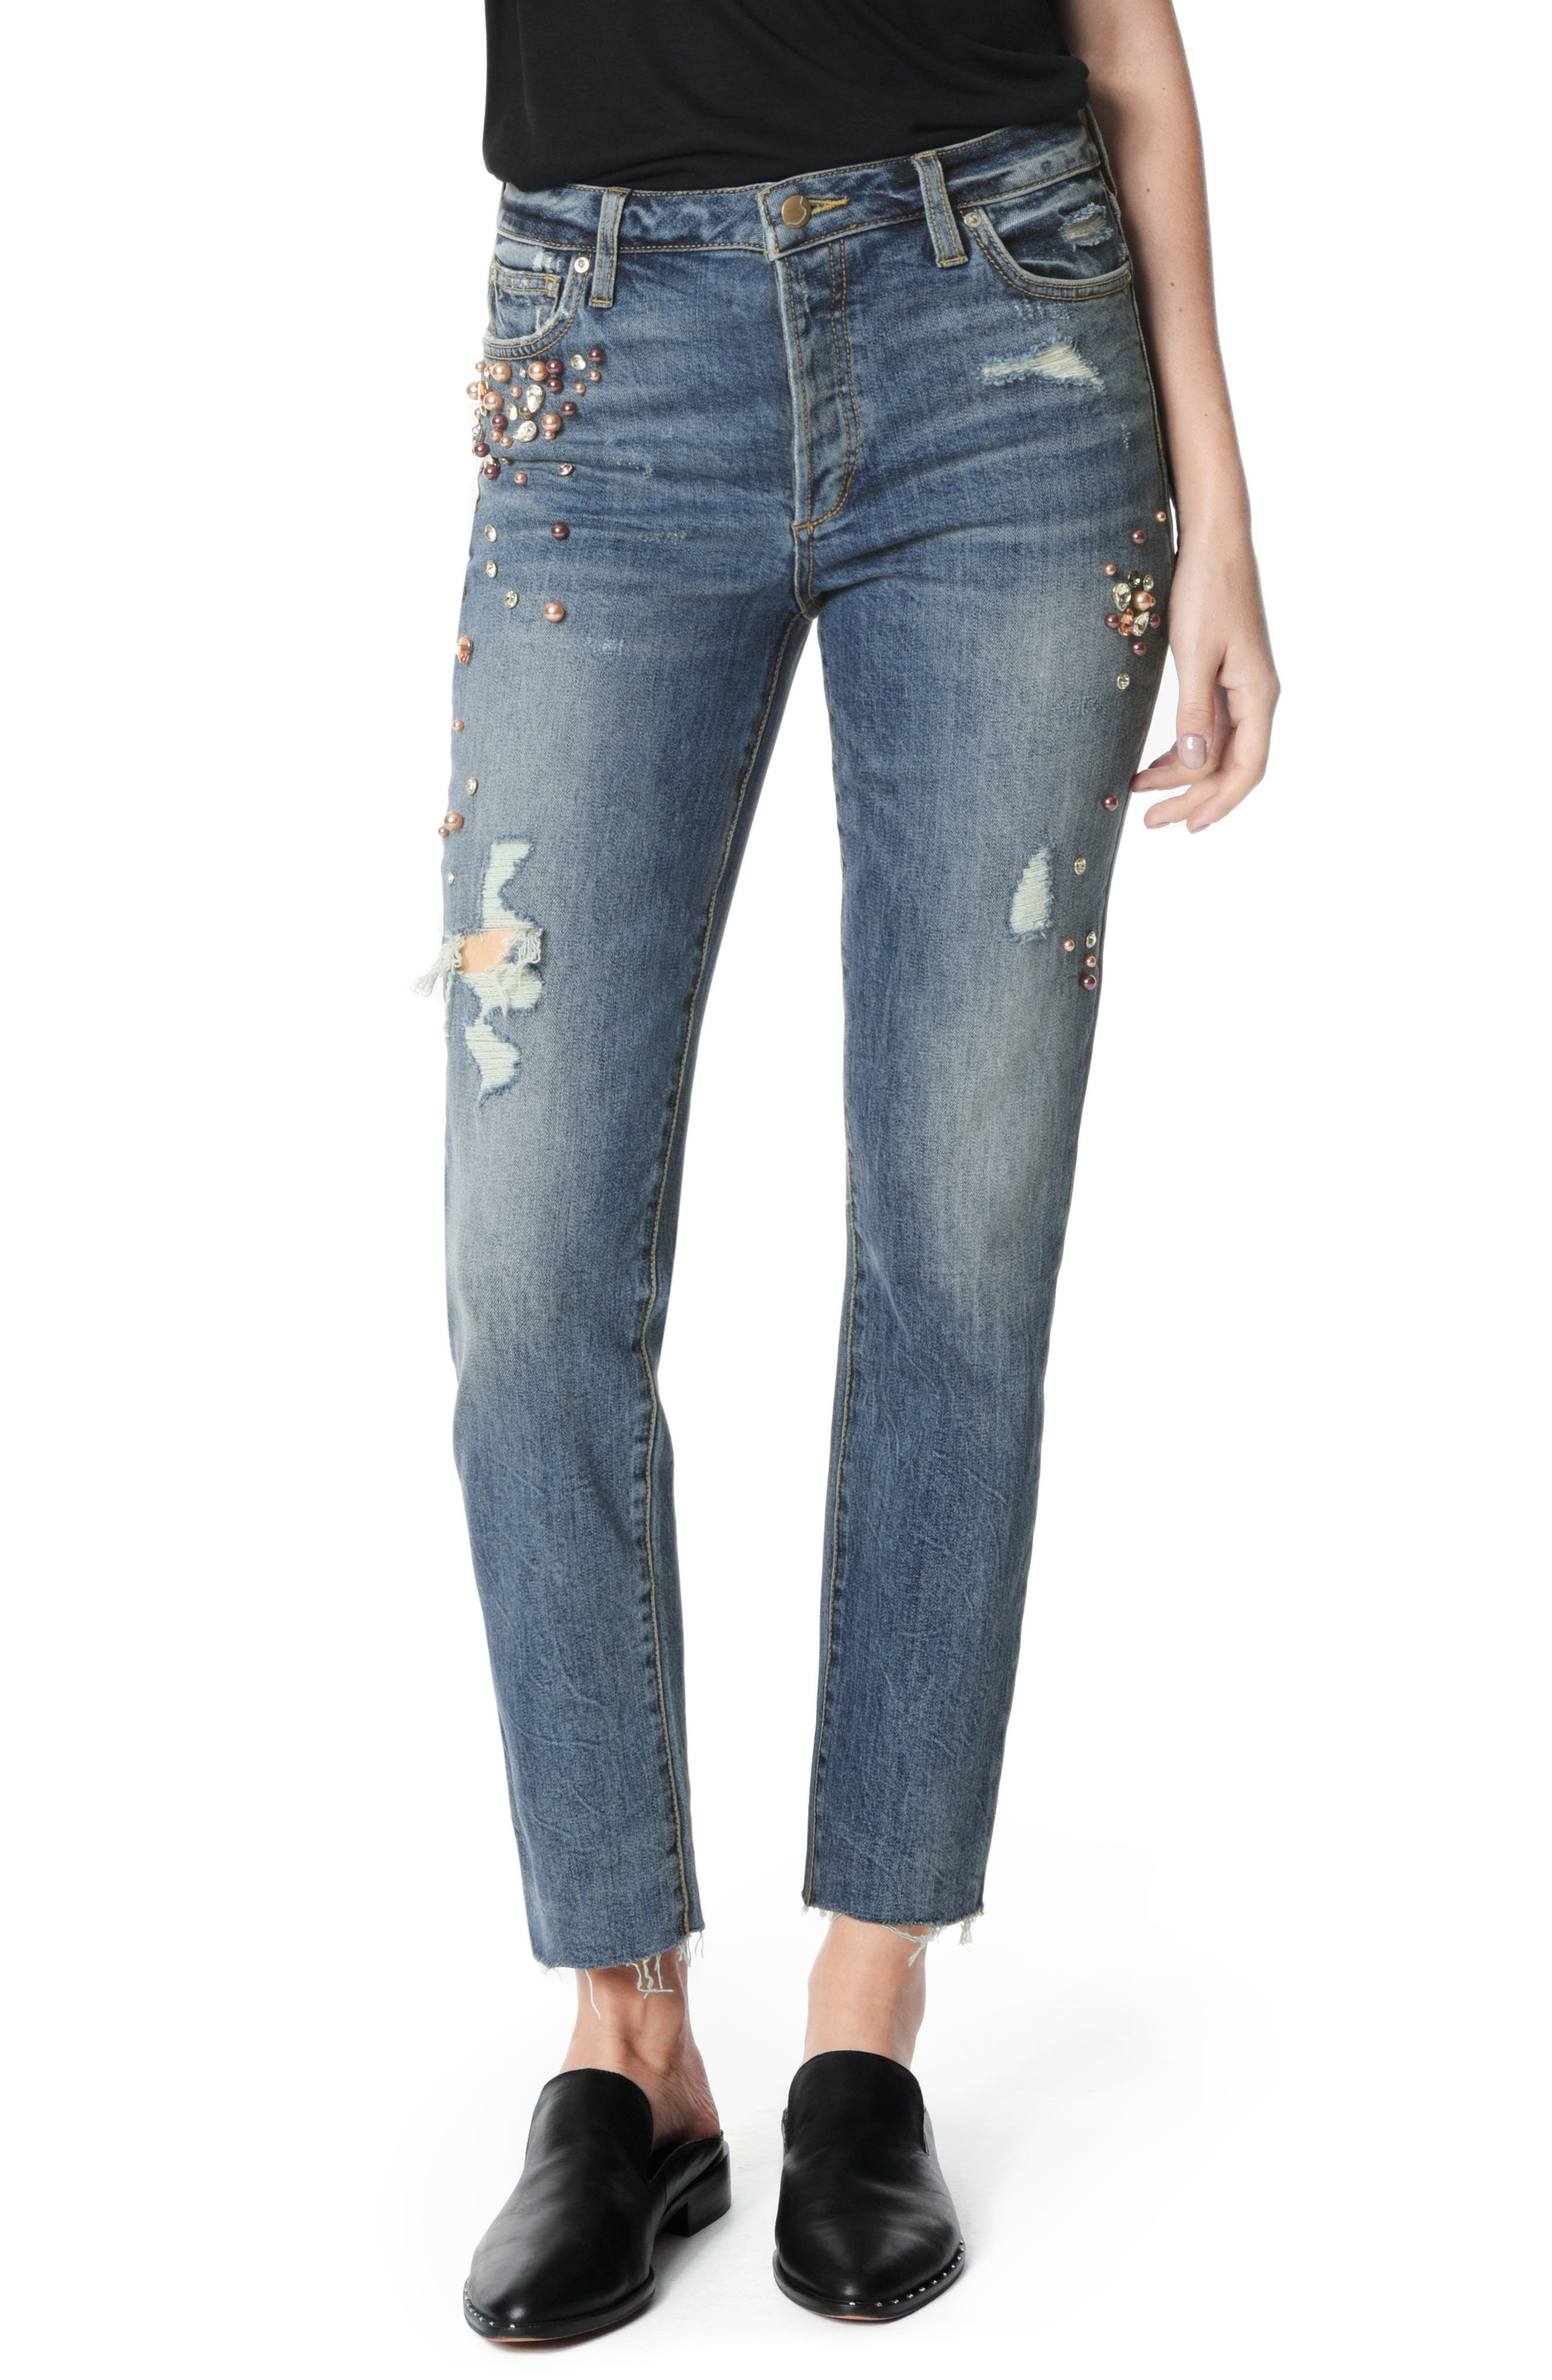 JOE'S Smith Embellished High Waist Raw Hem Ankle Boyfriend Jeans, Main, color, SHEYENNE